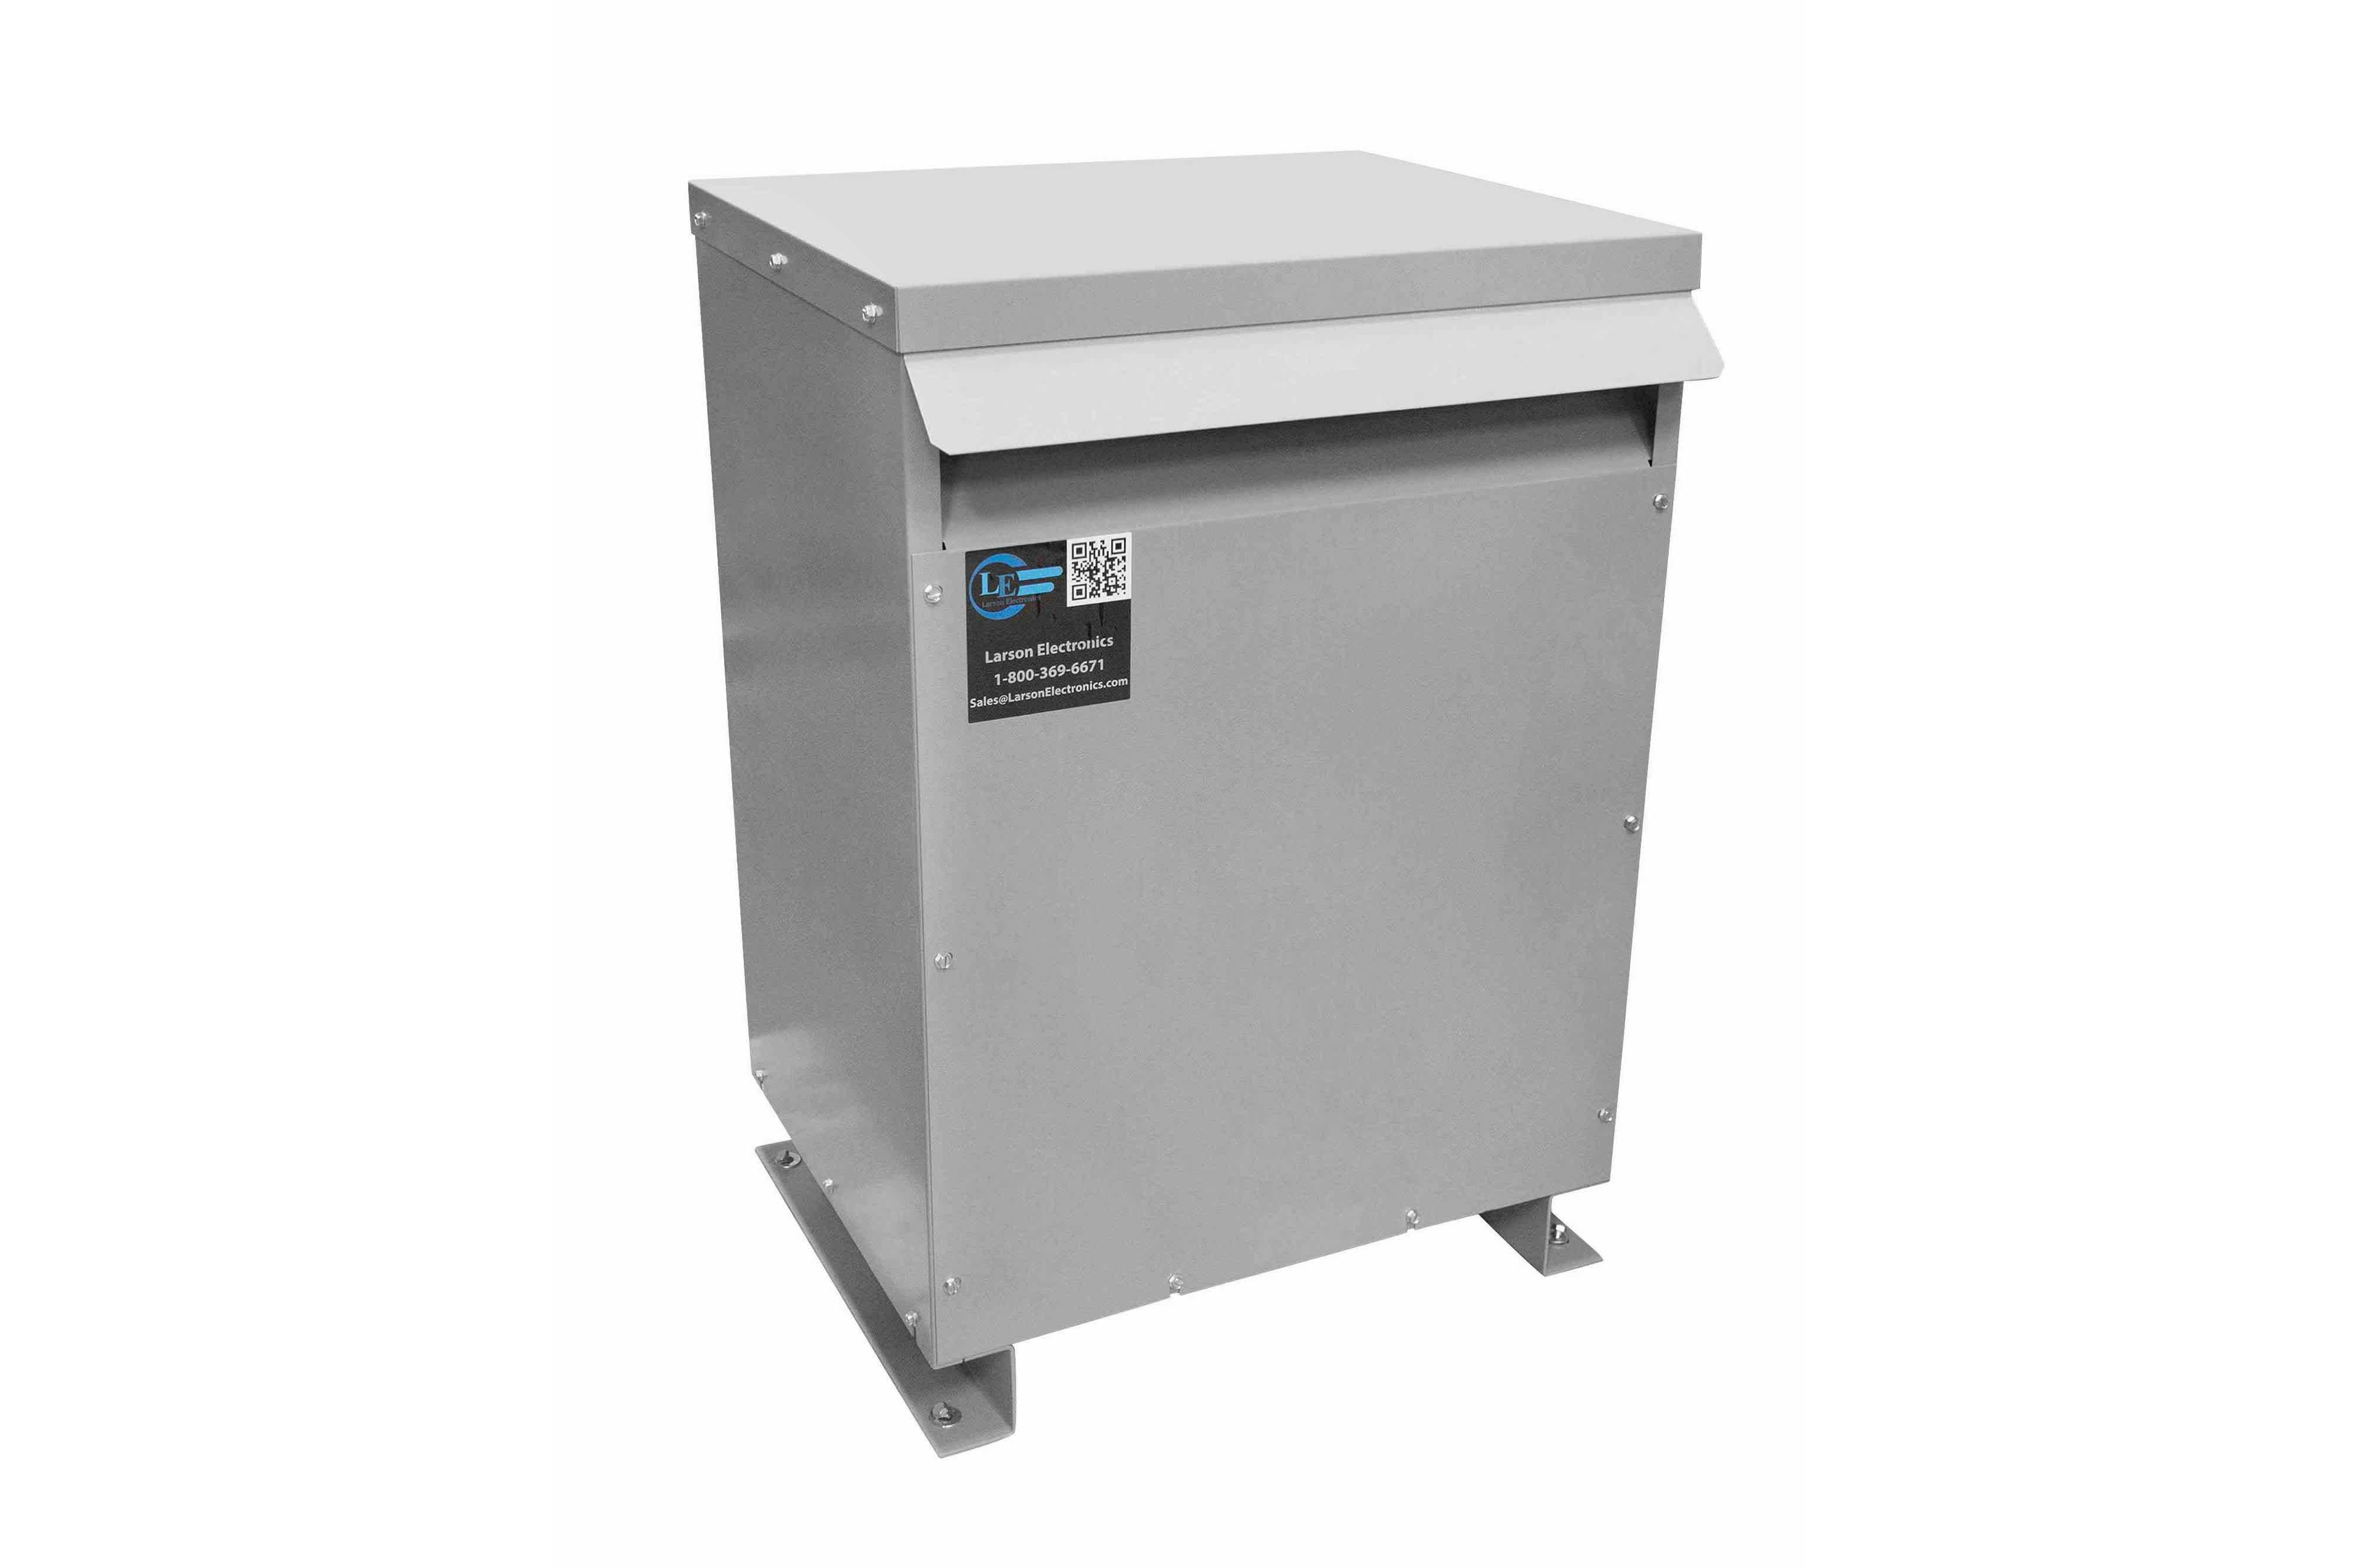 200 kVA 3PH Isolation Transformer, 220V Wye Primary, 208Y/120 Wye-N Secondary, N3R, Ventilated, 60 Hz